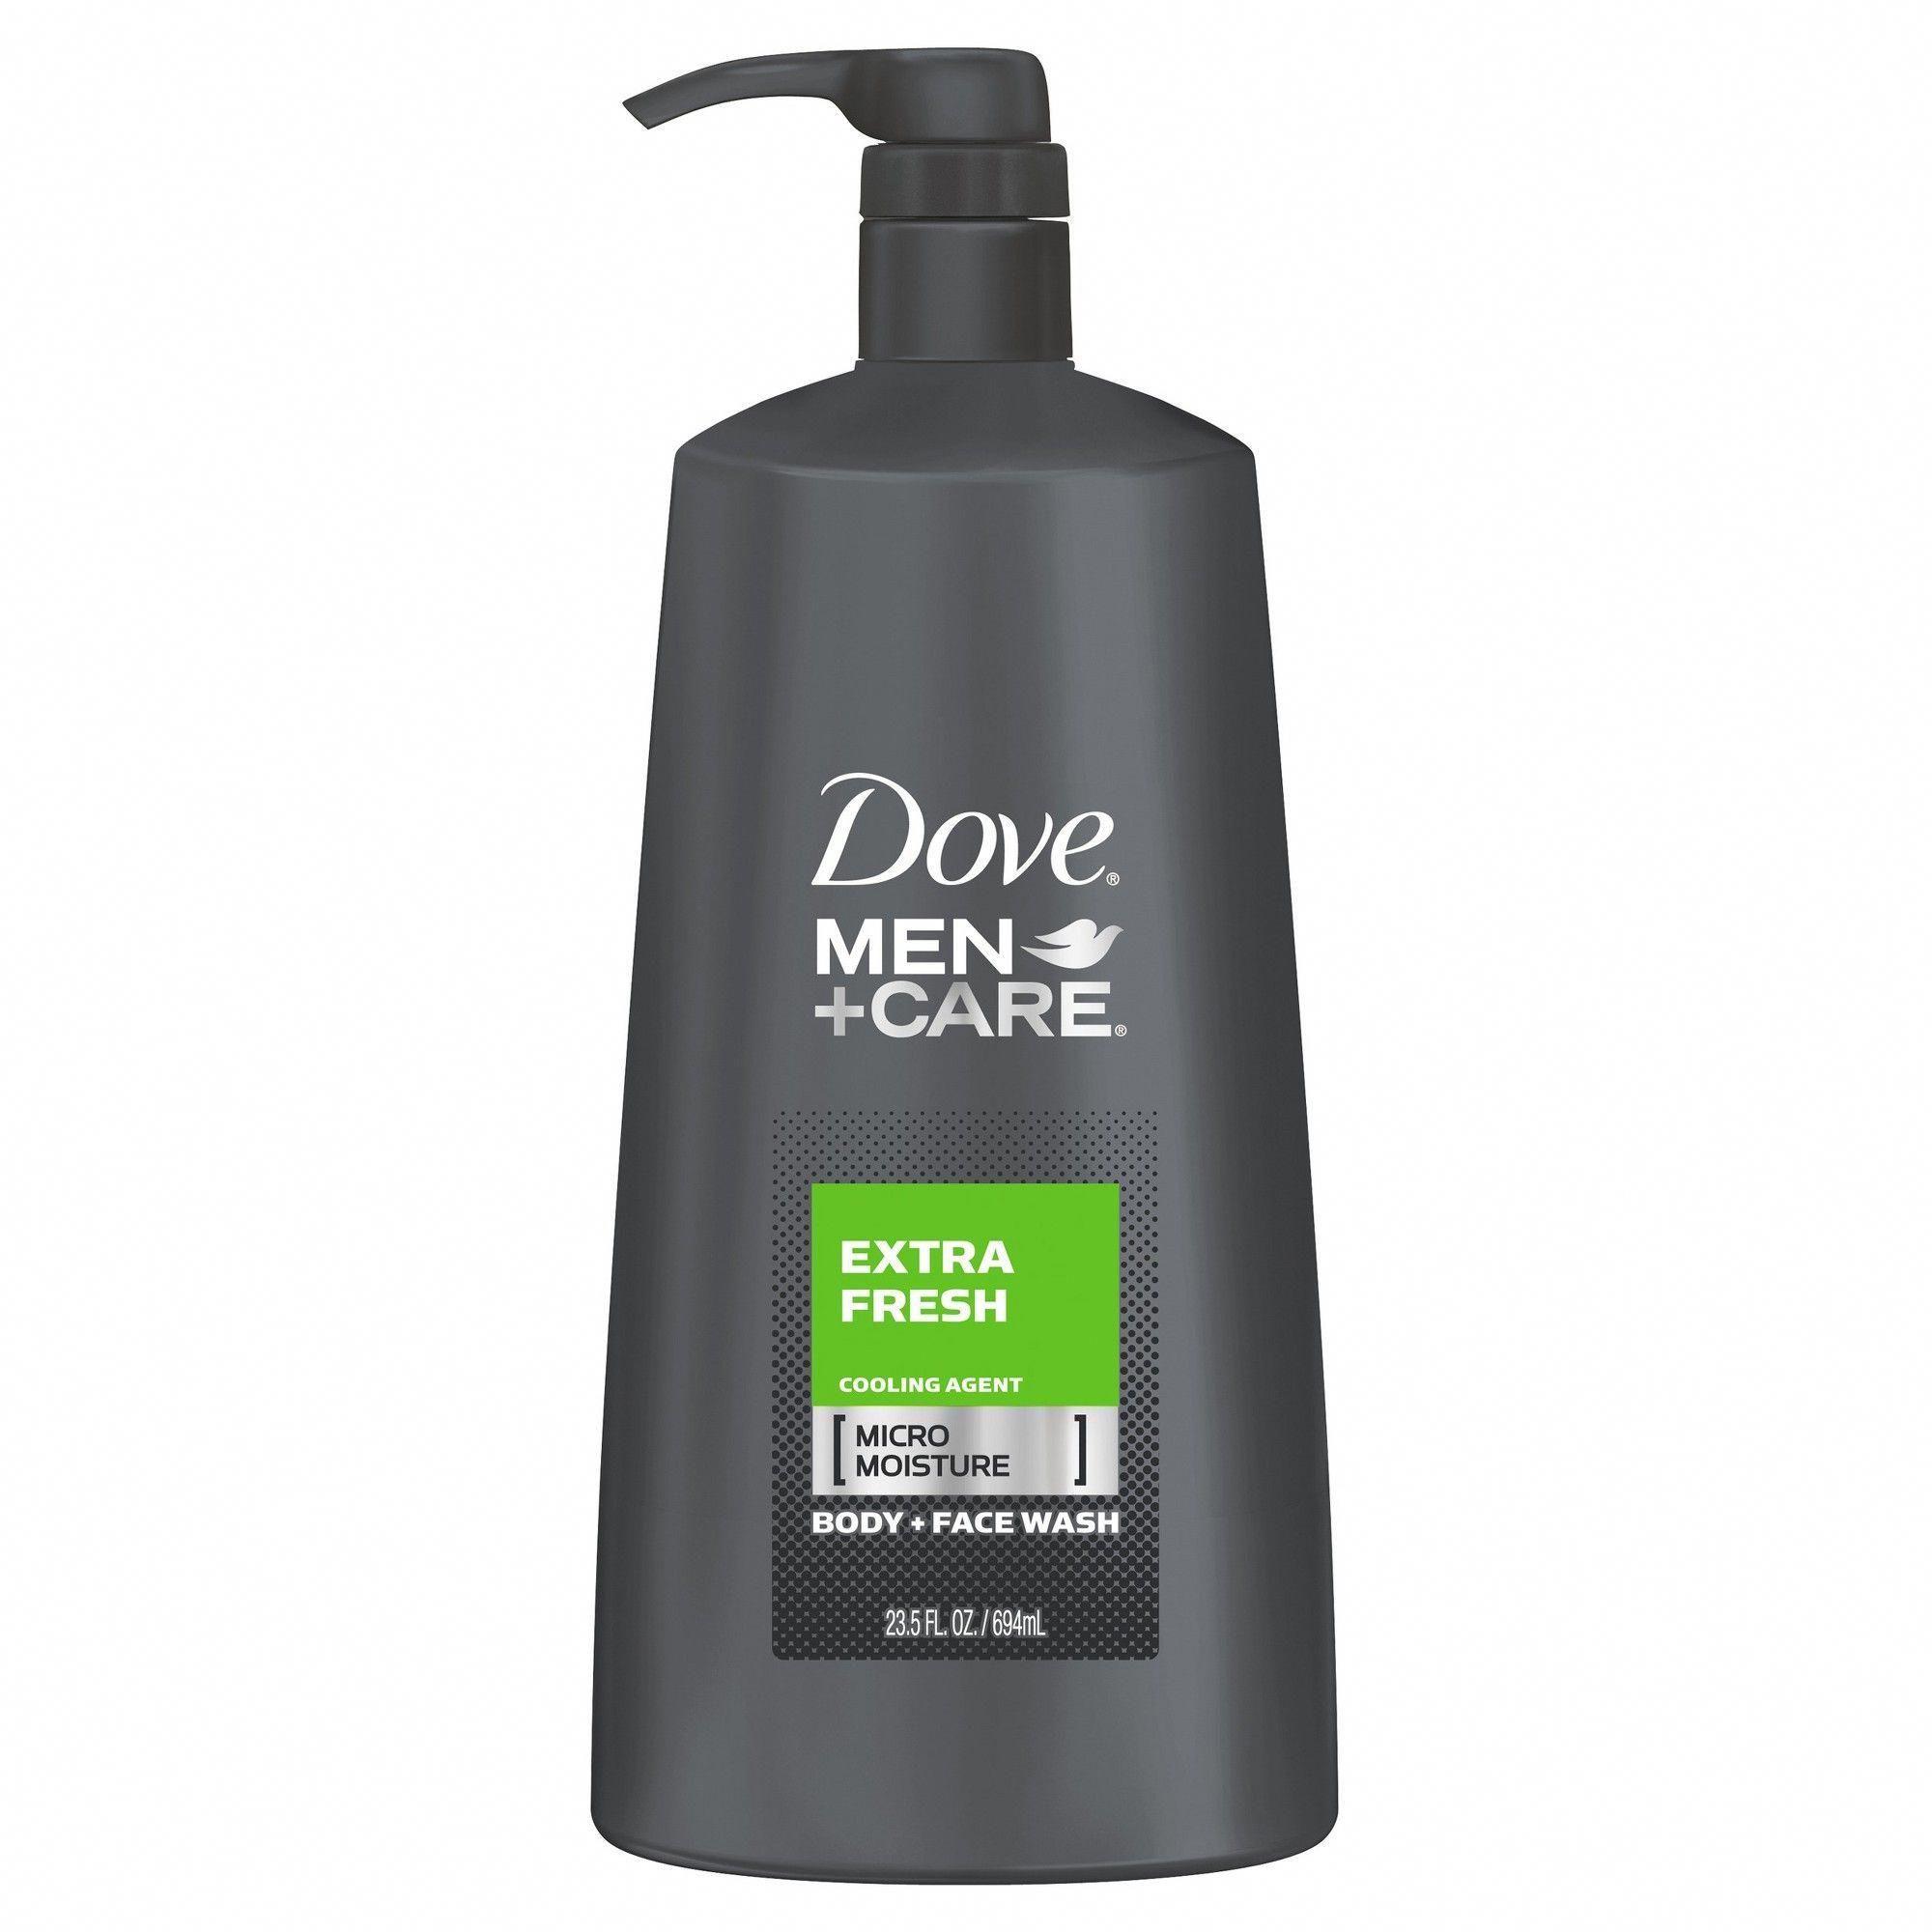 Dove Men+Care Extra Fresh Micro Moisture Cooling Body Wash